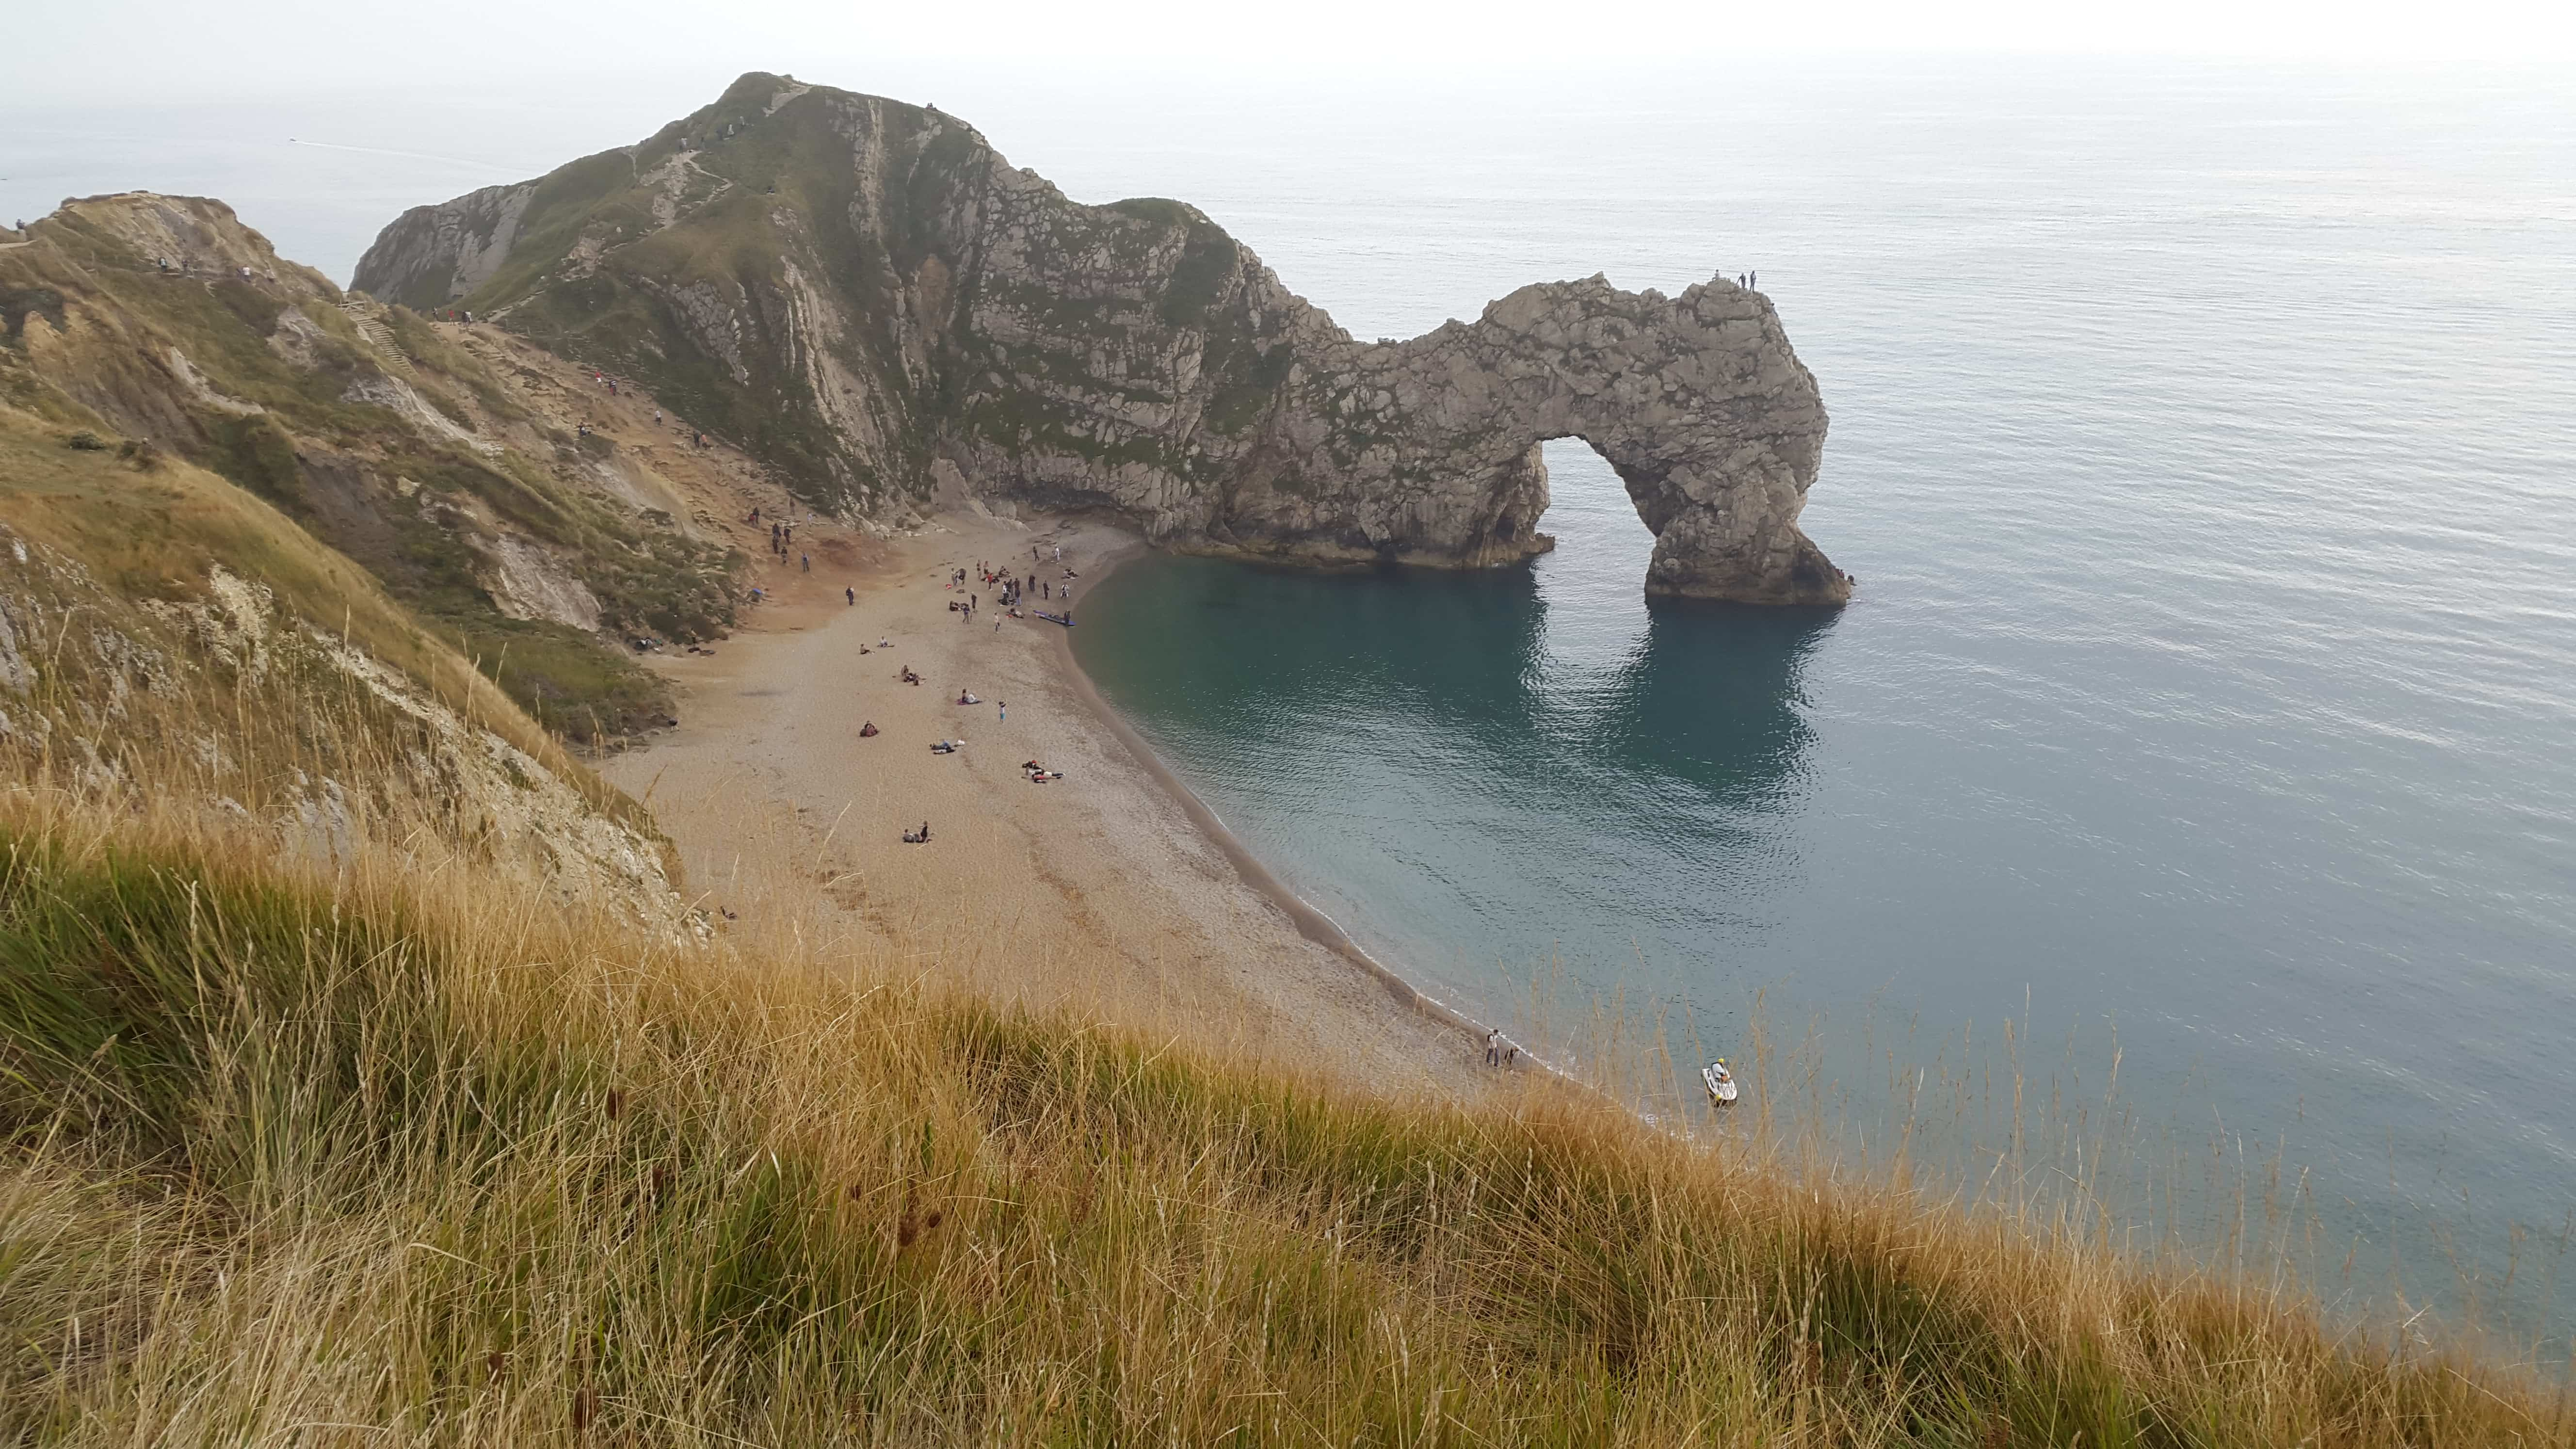 Durdle door, Dorset, Jurassic Coast, UNESCO world heritage, Lulworth Cove